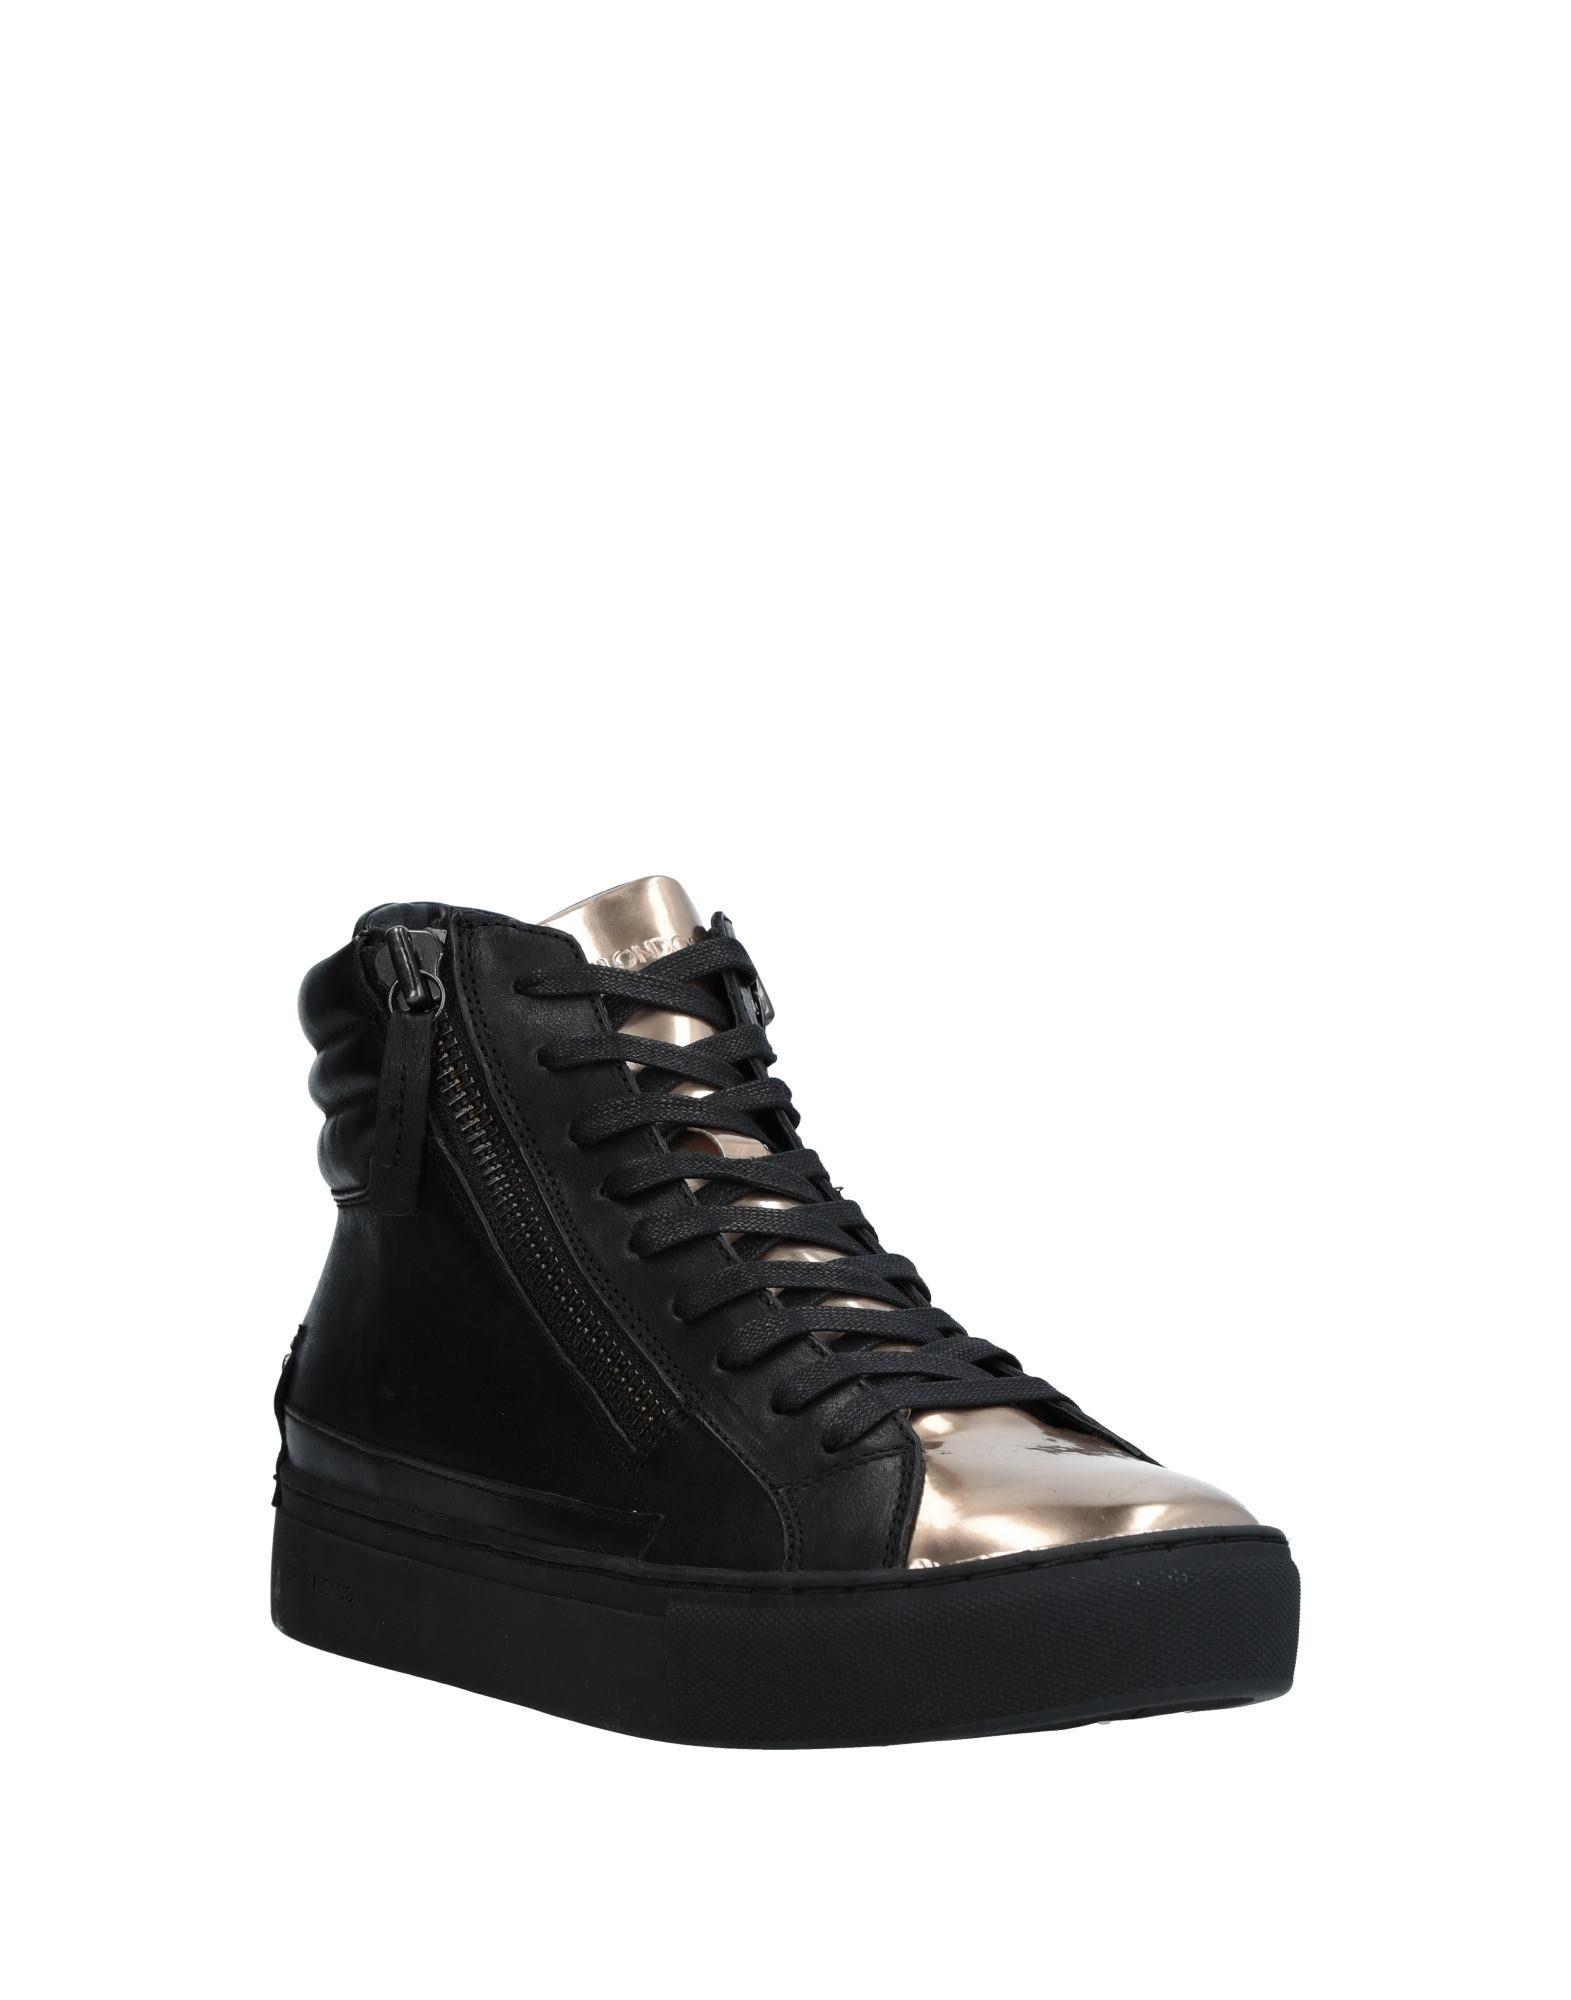 Crime Damen London Sneakers Damen Crime  11537987GW Gute Qualität beliebte Schuhe 67dabf